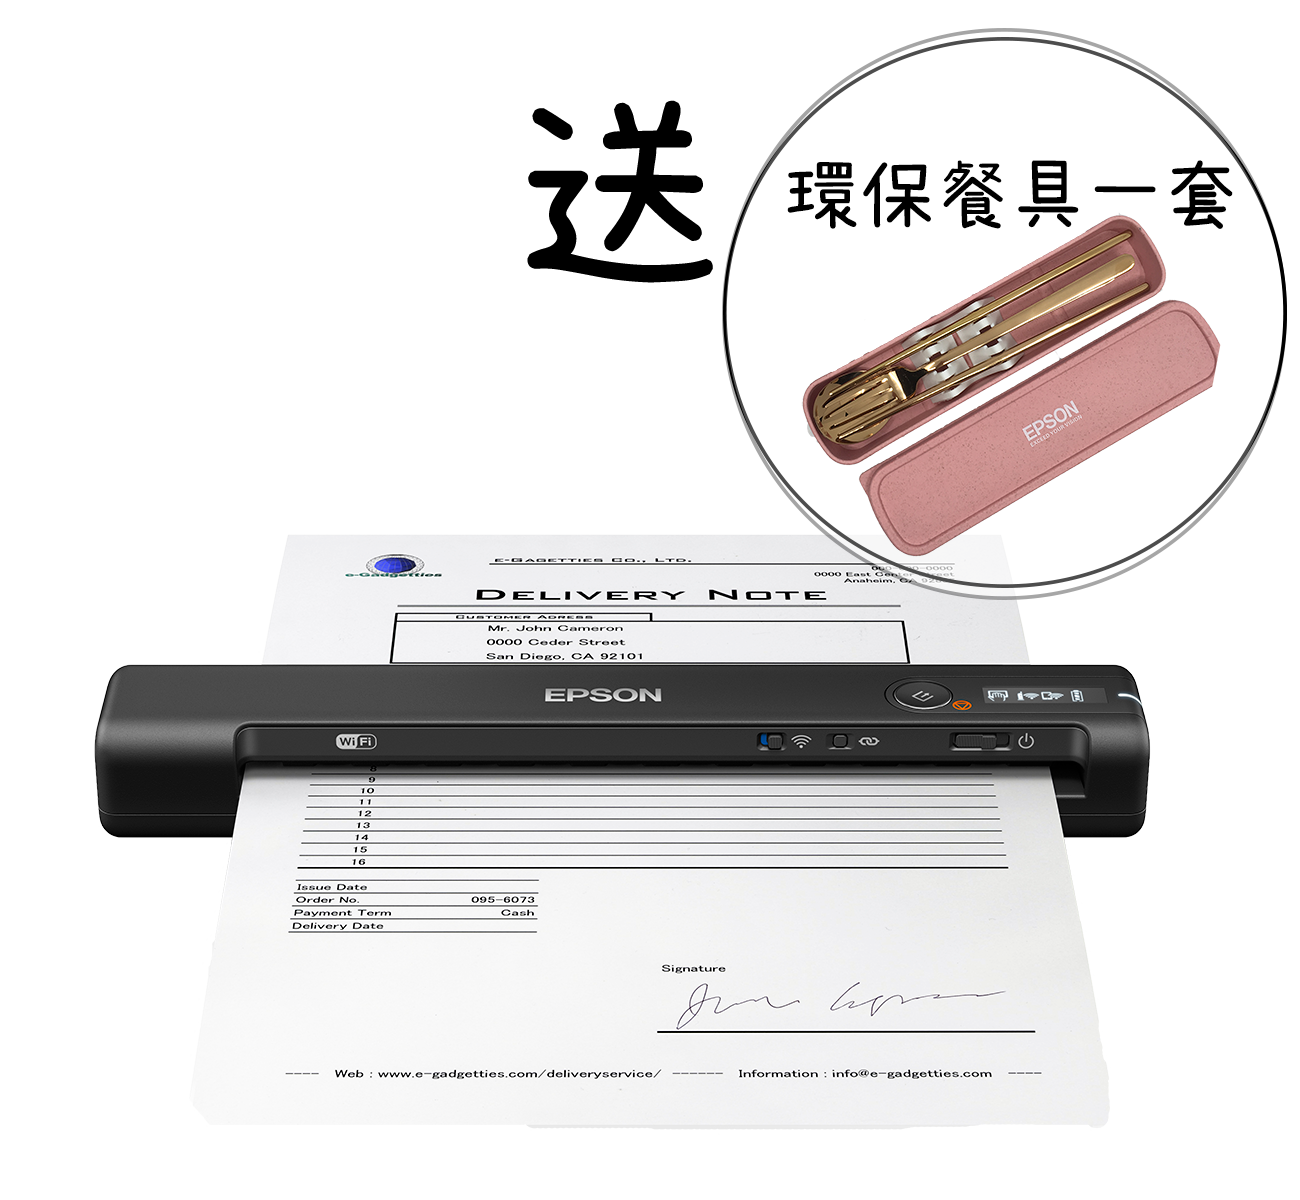 ES-60W Portable Scanner